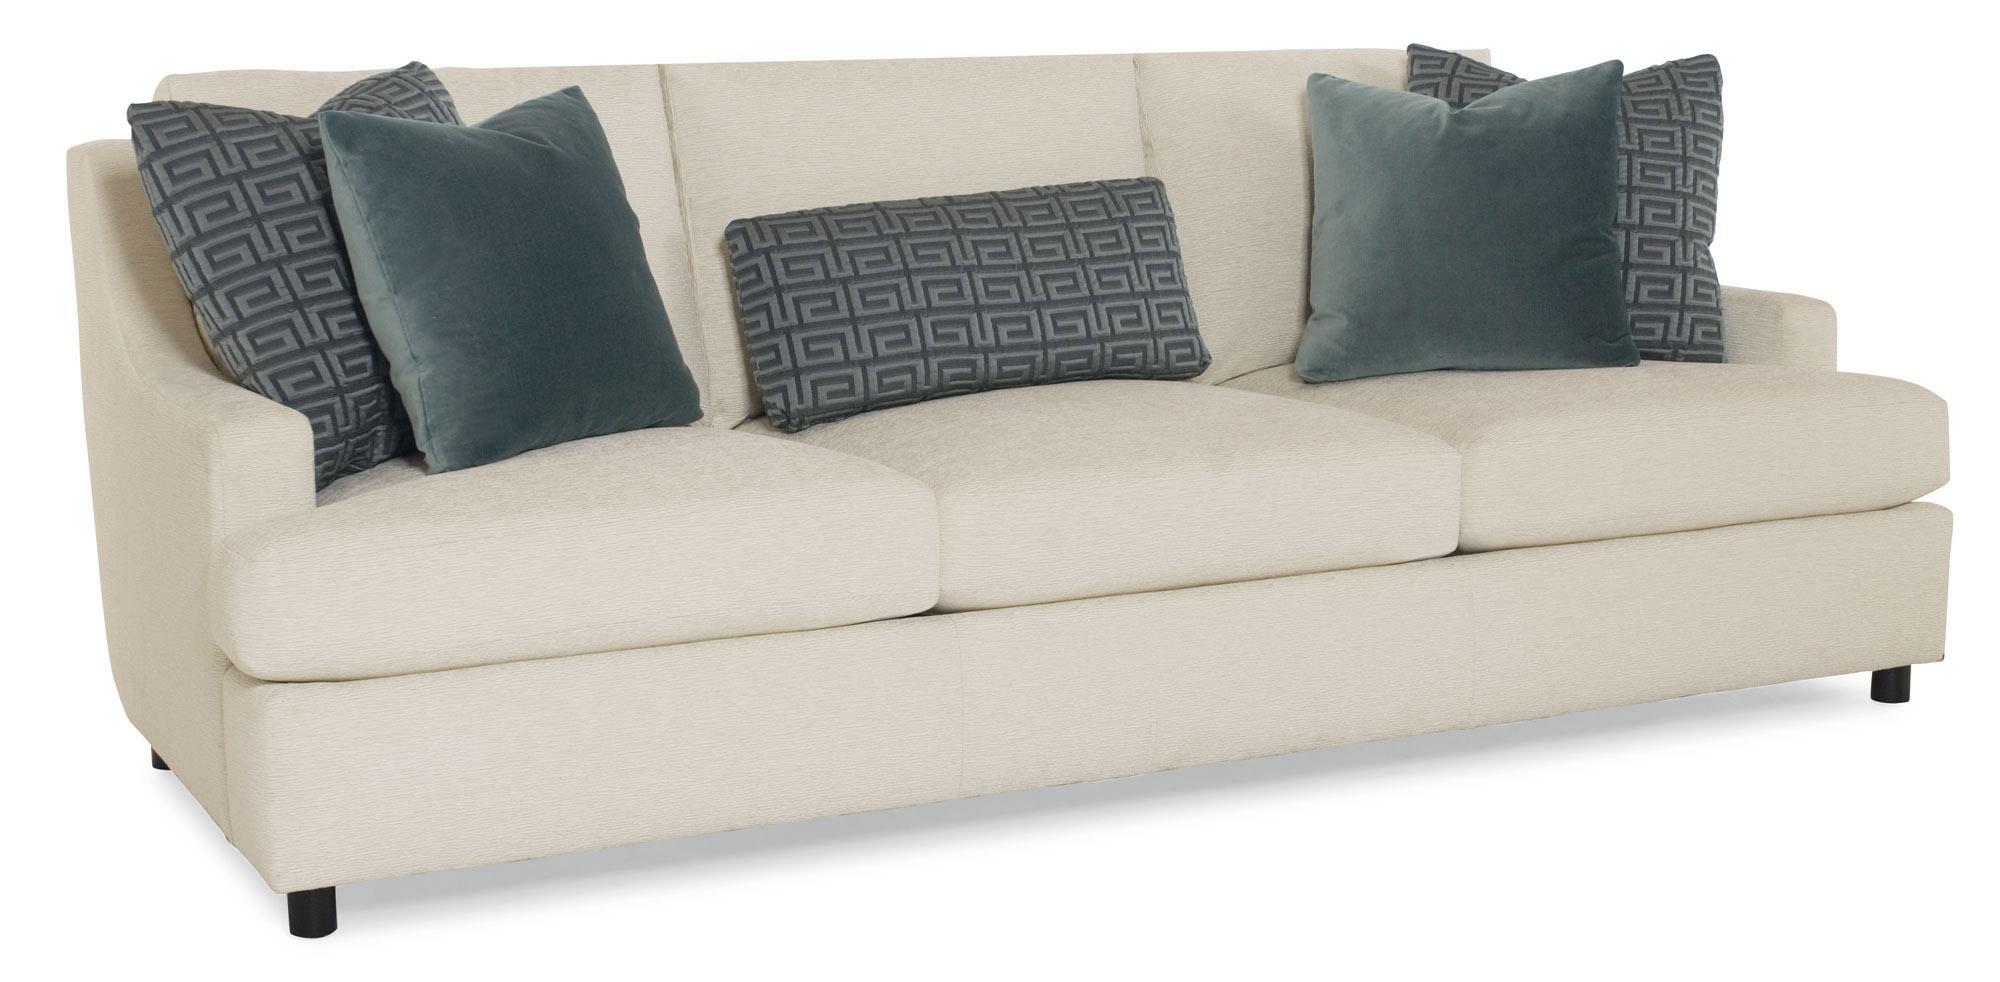 bernhardt furniture sofa how to clean a that smells 20 best ideas sofas